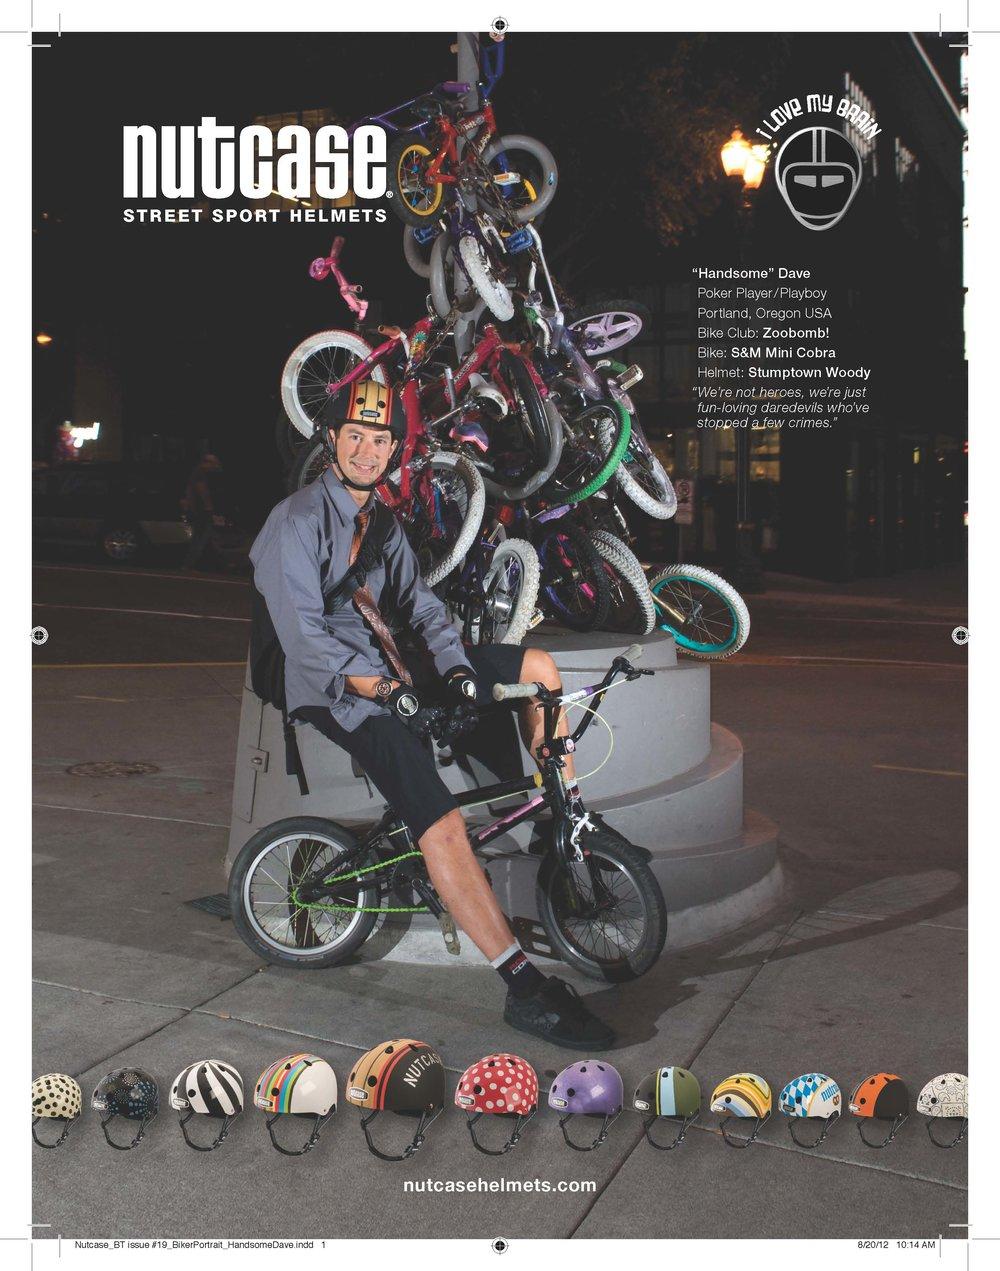 Nutcase_BT issue #19_BikerPortrait_HandsomeDave_hi.jpg